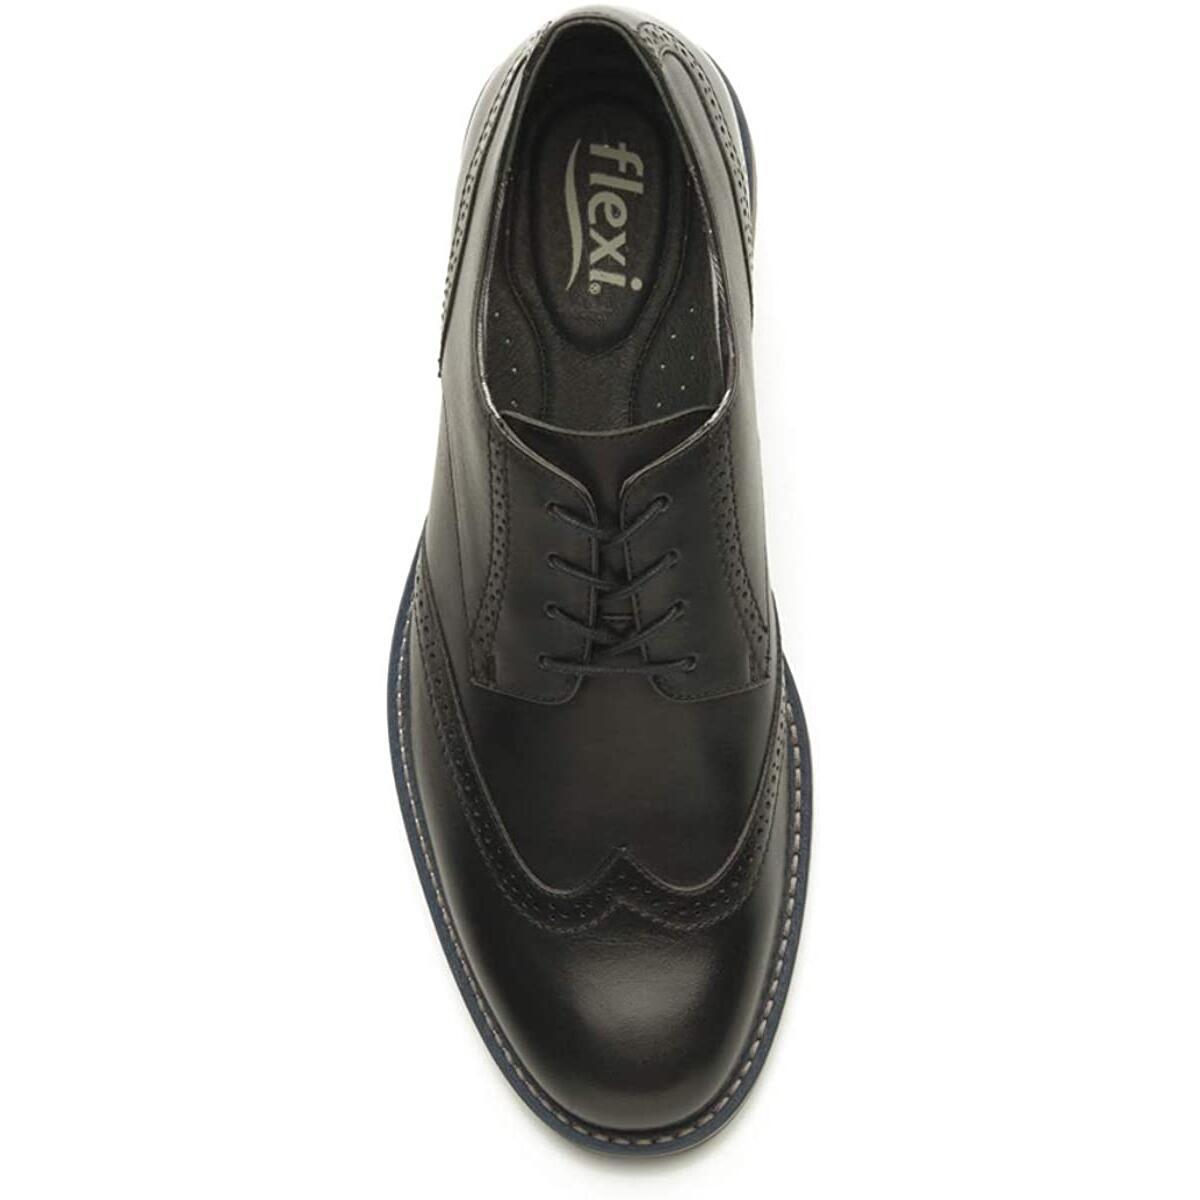 Flexi Jeremy Men's Genuine Leather Four Eyelet Classy Lace Up Dress Shoe |